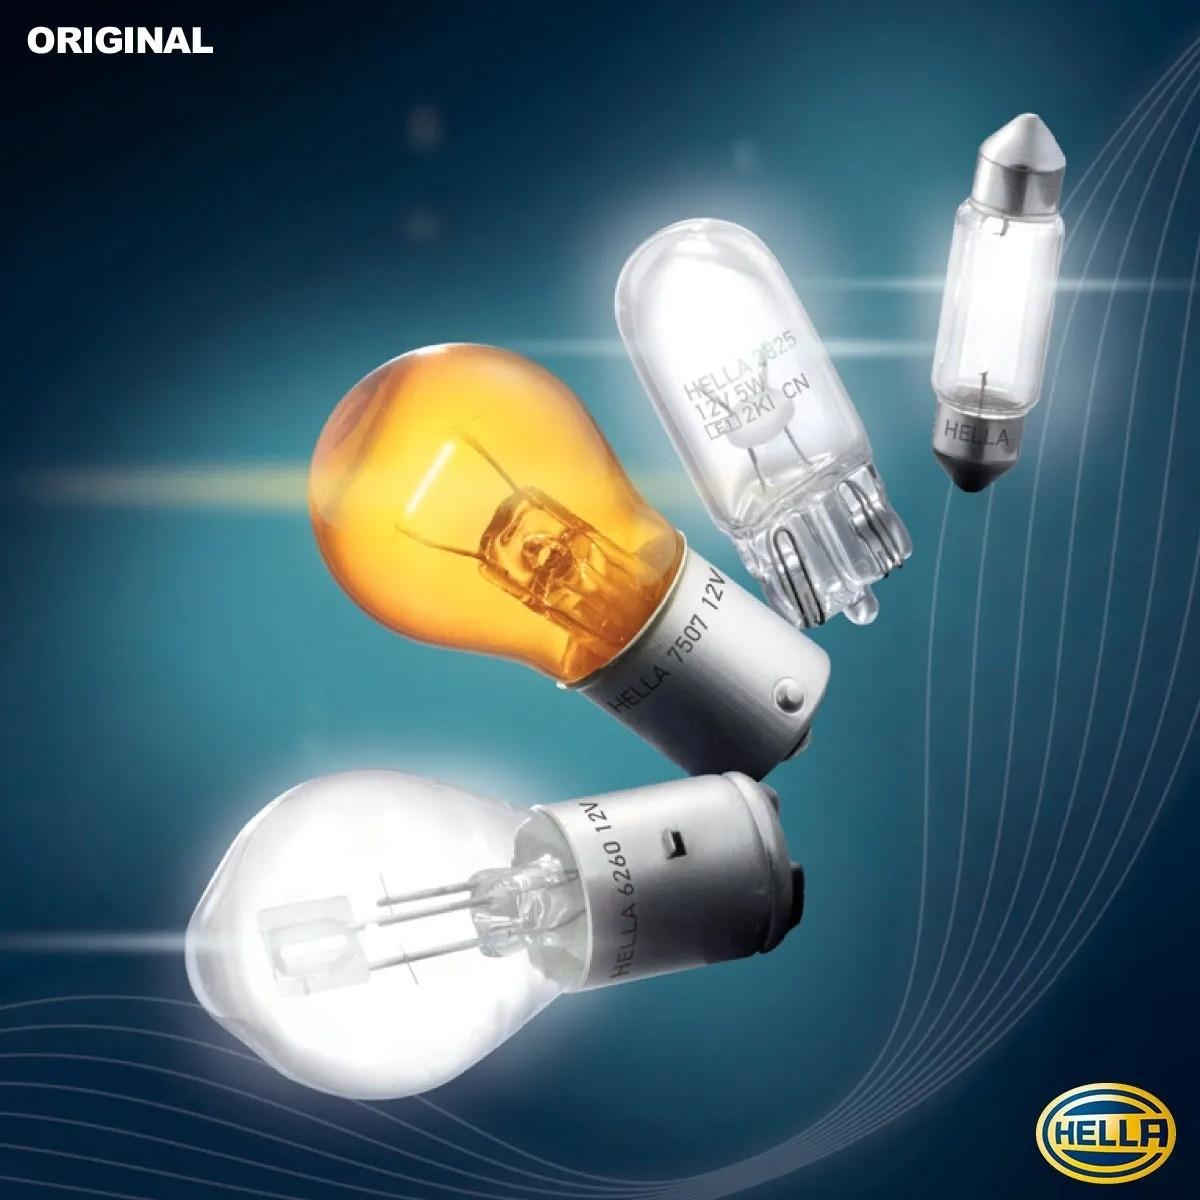 LAMPADA CONVENCIONAL 12V 35W FAROL H8 UNIVERSAL HELLA